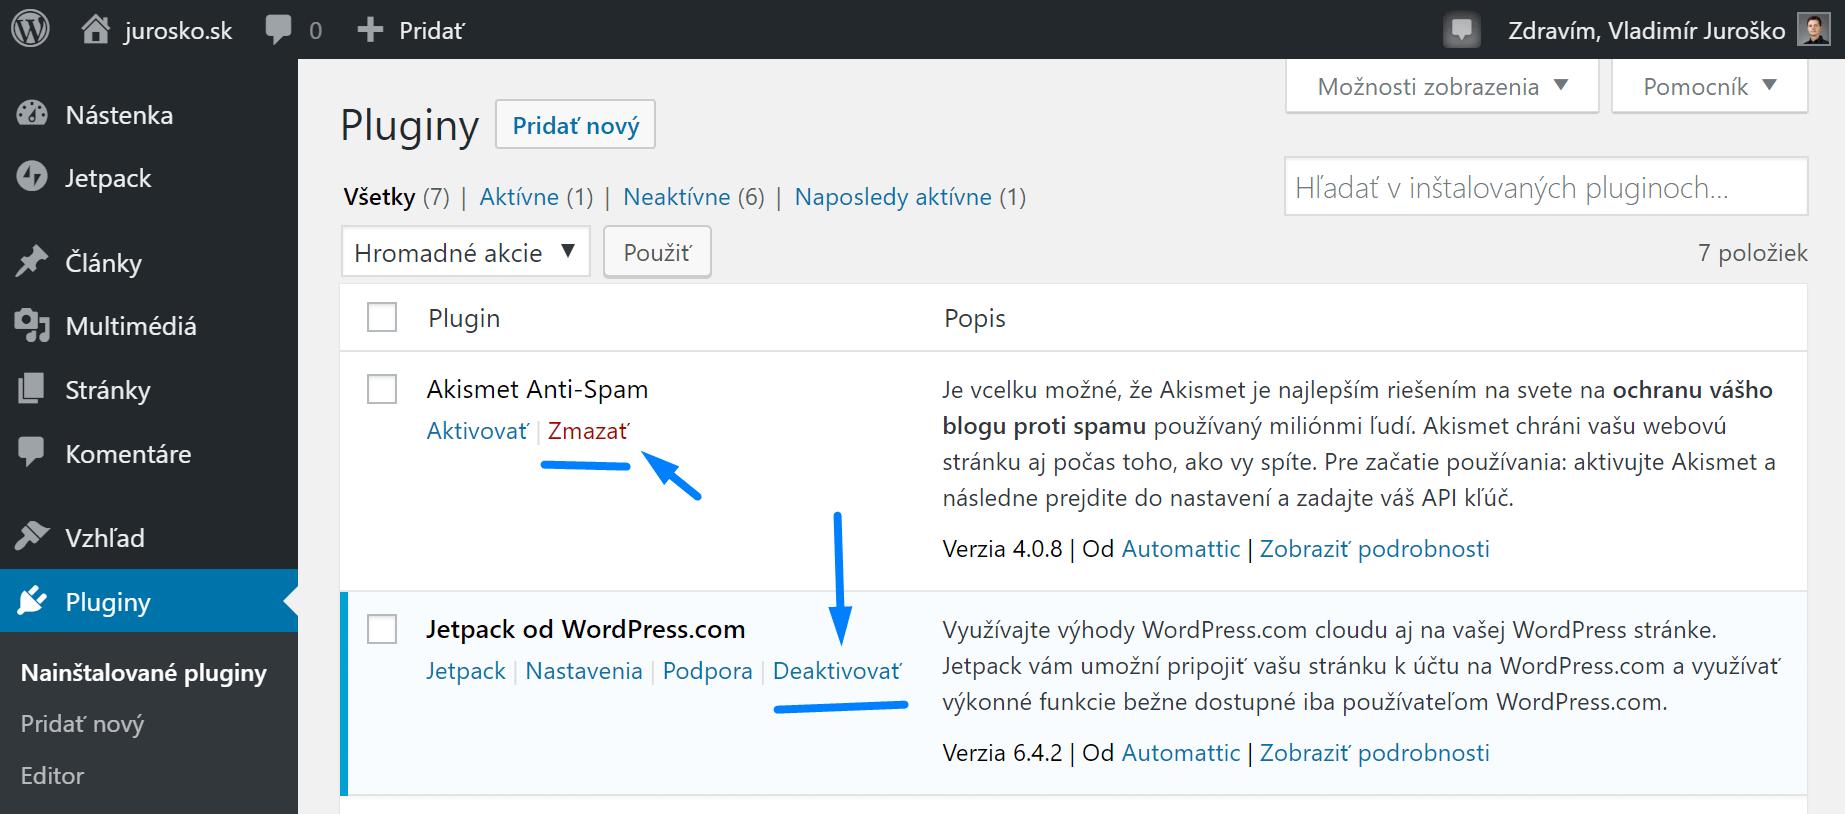 Deaktivovať / Zmazať WordPress plugin